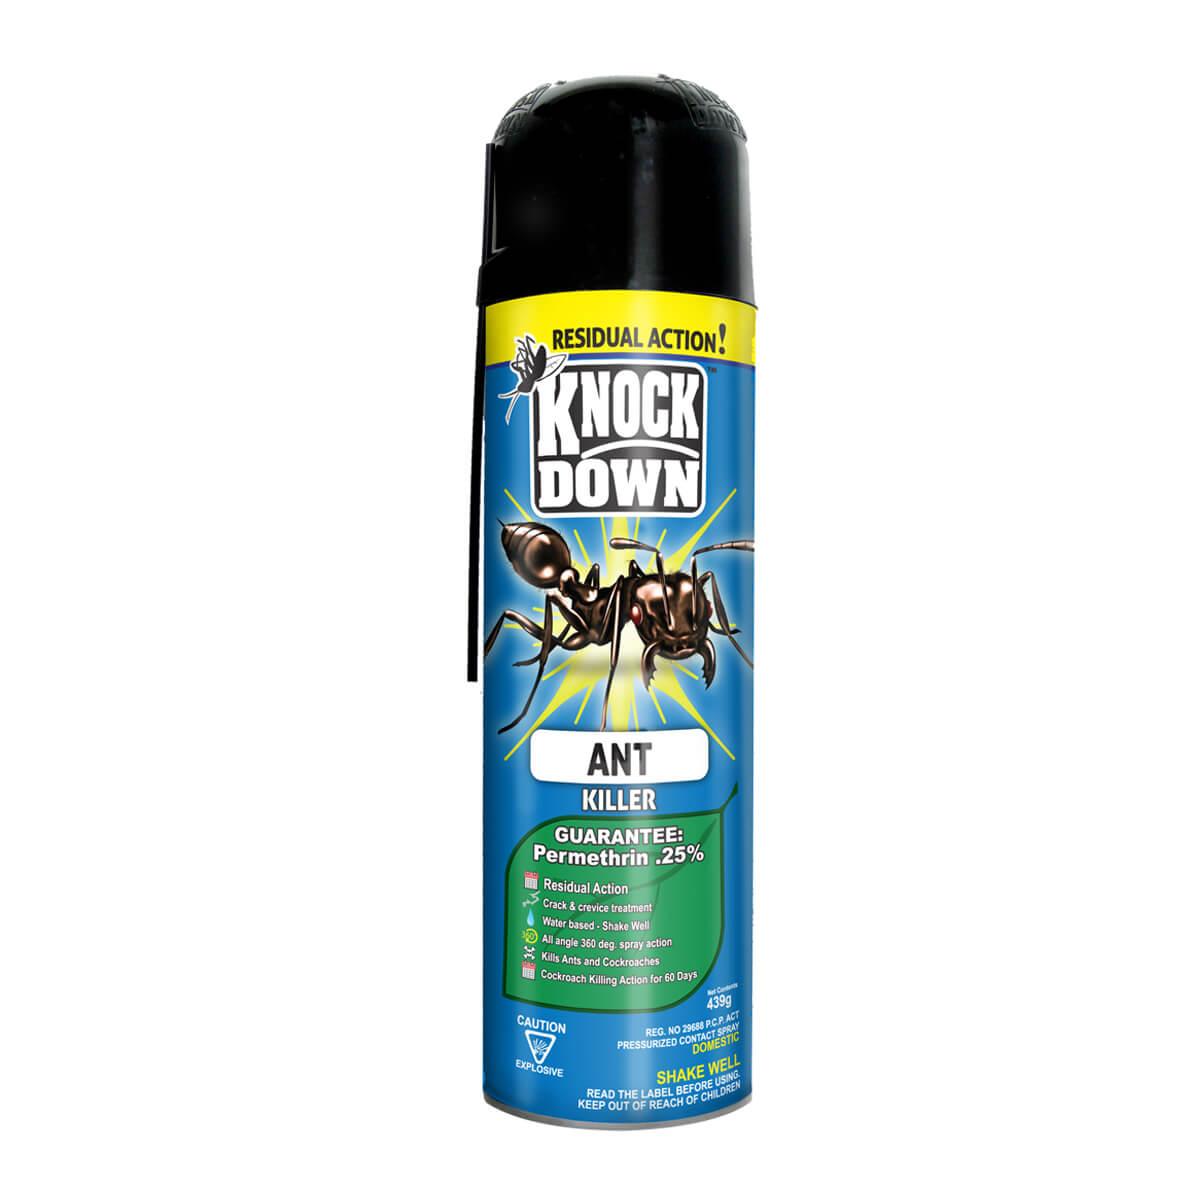 Knock Down Ant Killer - 60 day residual - 439 g